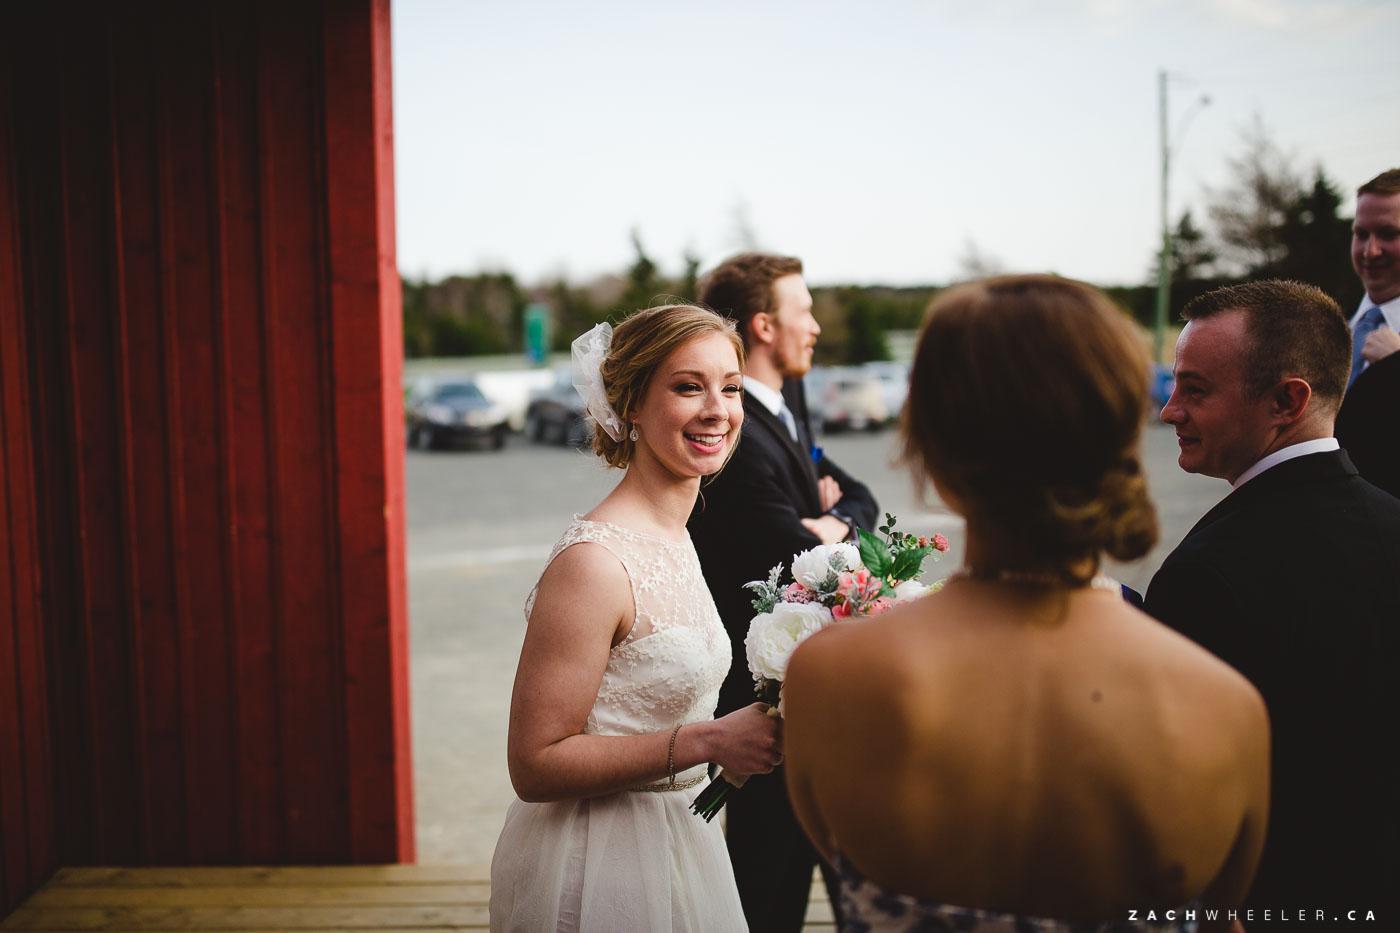 Sarah-Grant-Lesters-Fram-Wedding-84